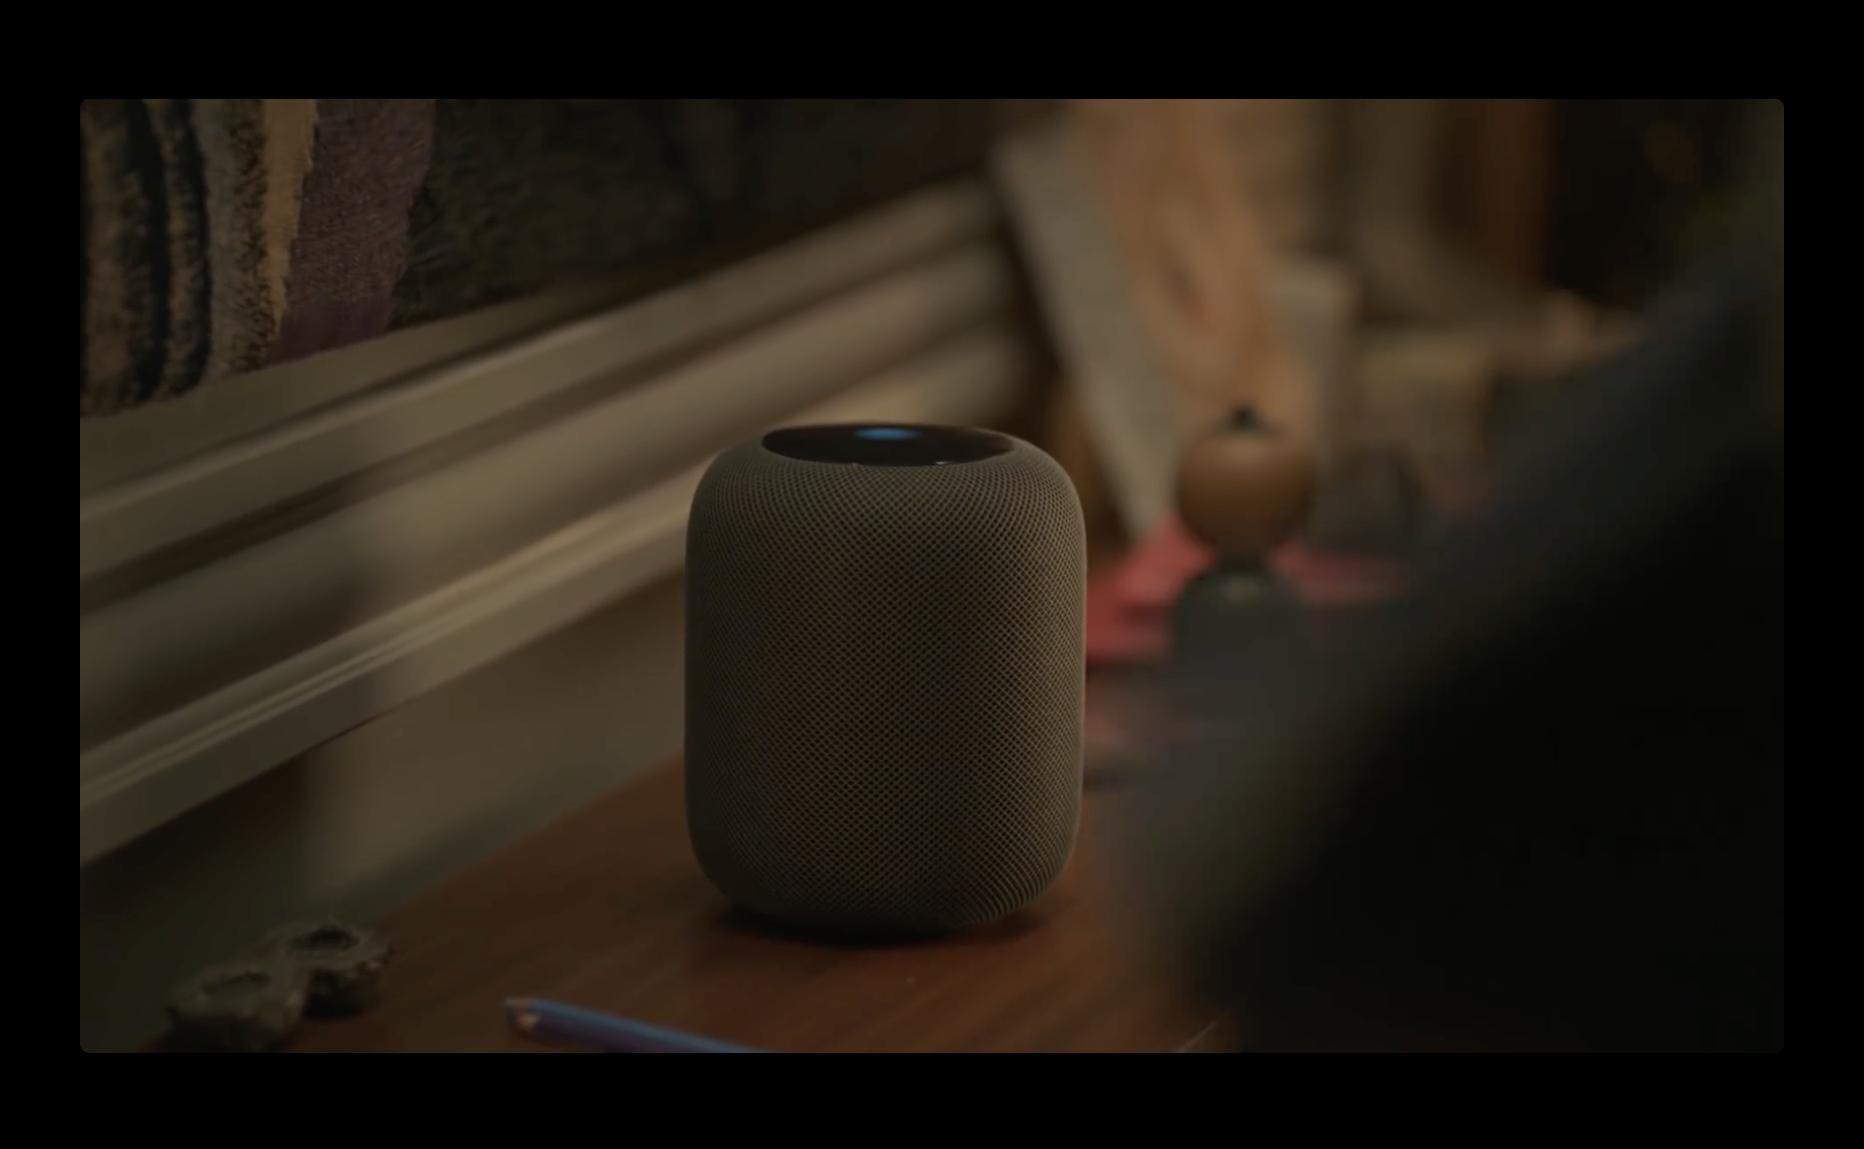 Apple、「watchOS 4.3.1 beta 4 (15T5565a)」を開発者にリリース